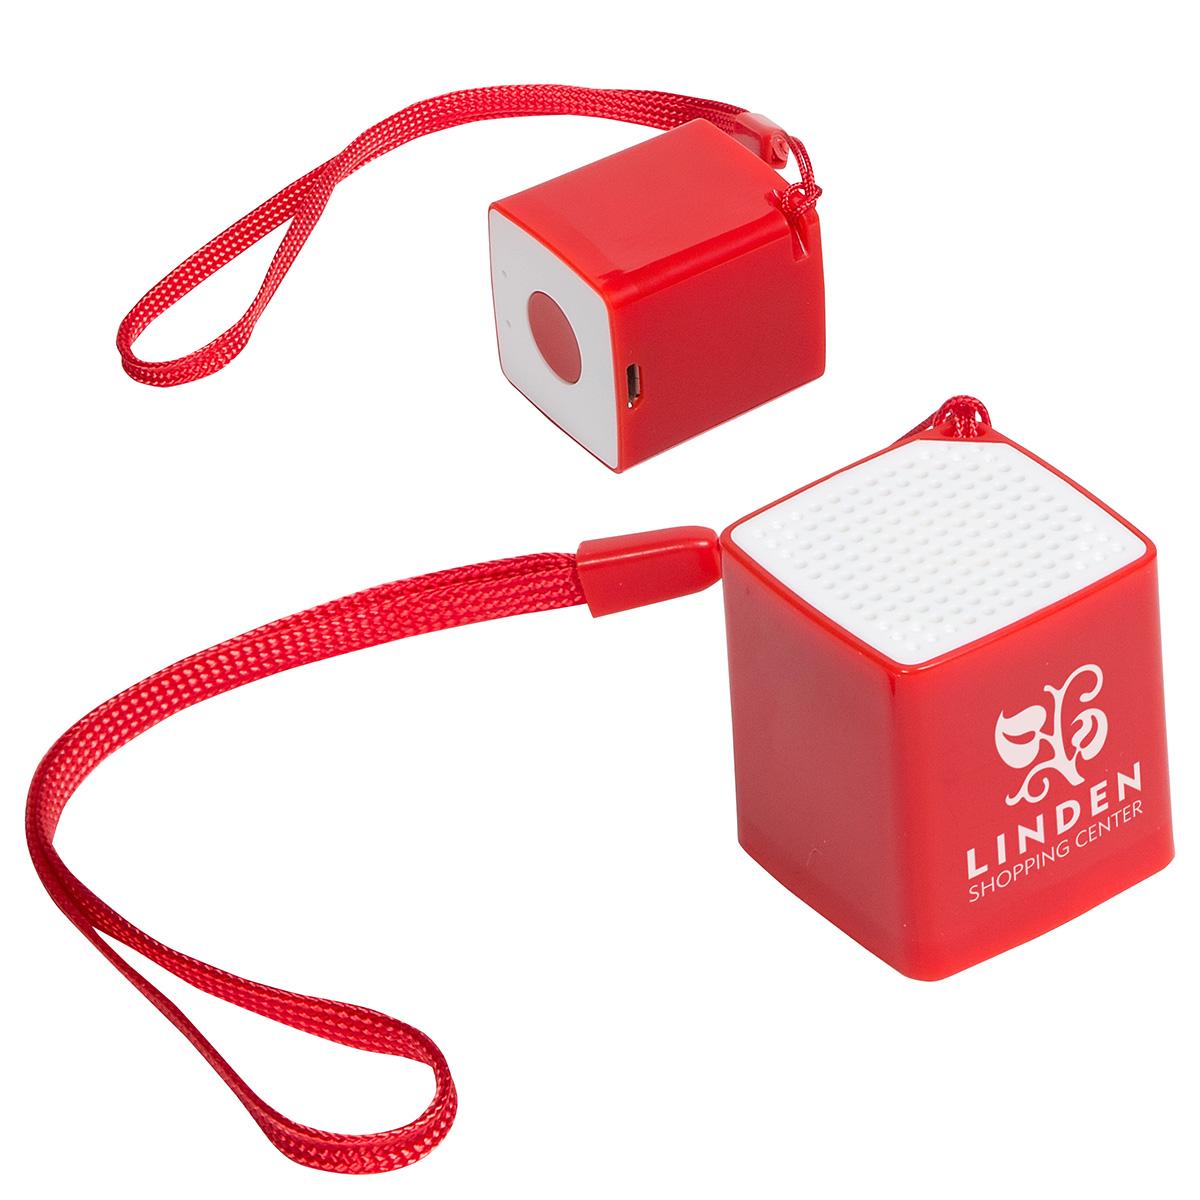 Wireless Mini Cube Speaker with Selfie Button & Mic, ESP-MC16 - 1 Colour Imprint